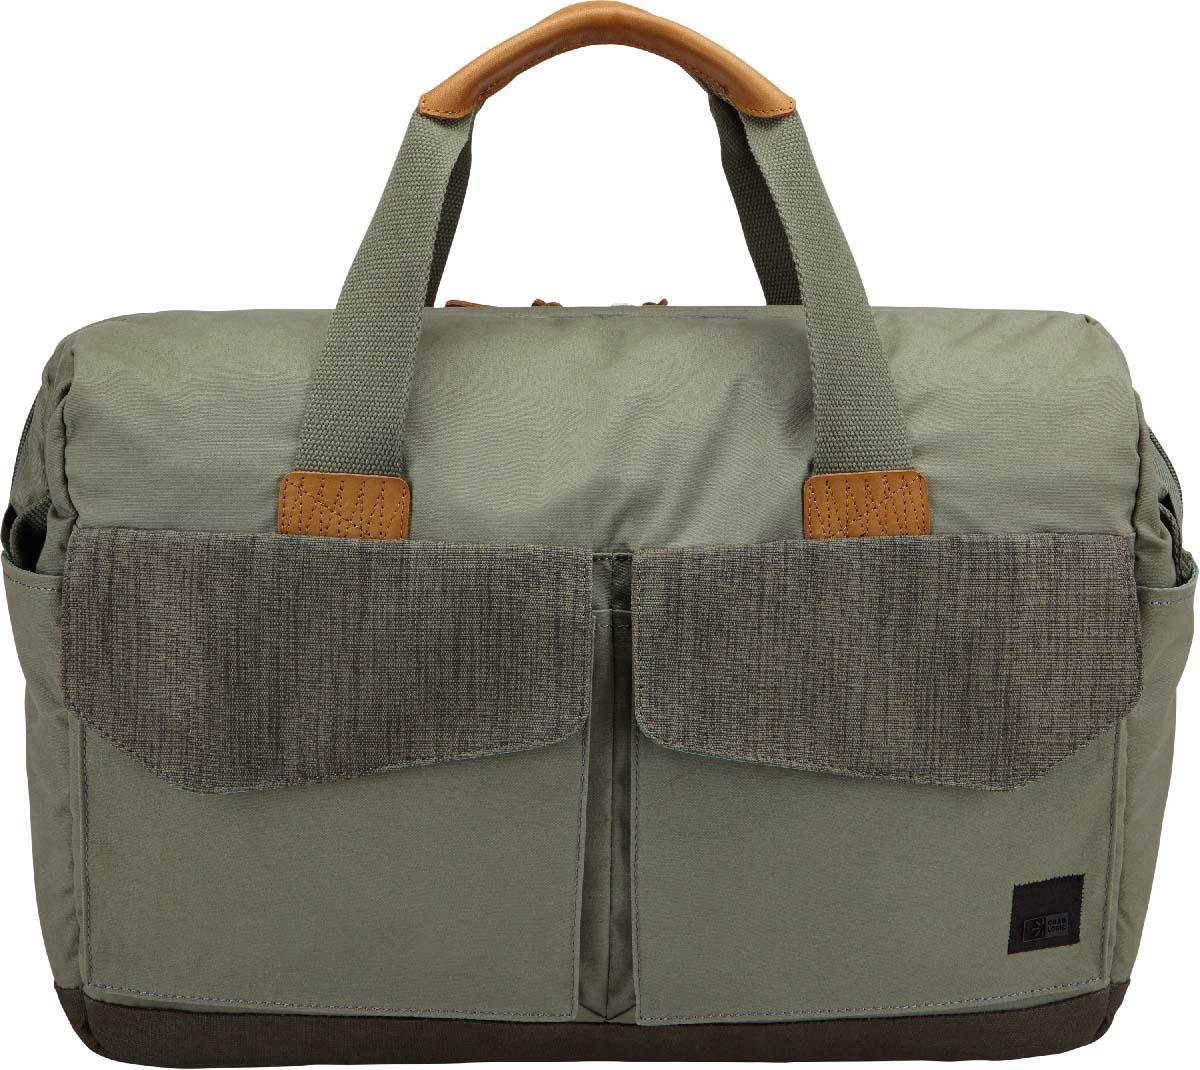 Case Logic LoDo Green, сумка для ноутбука 15,6